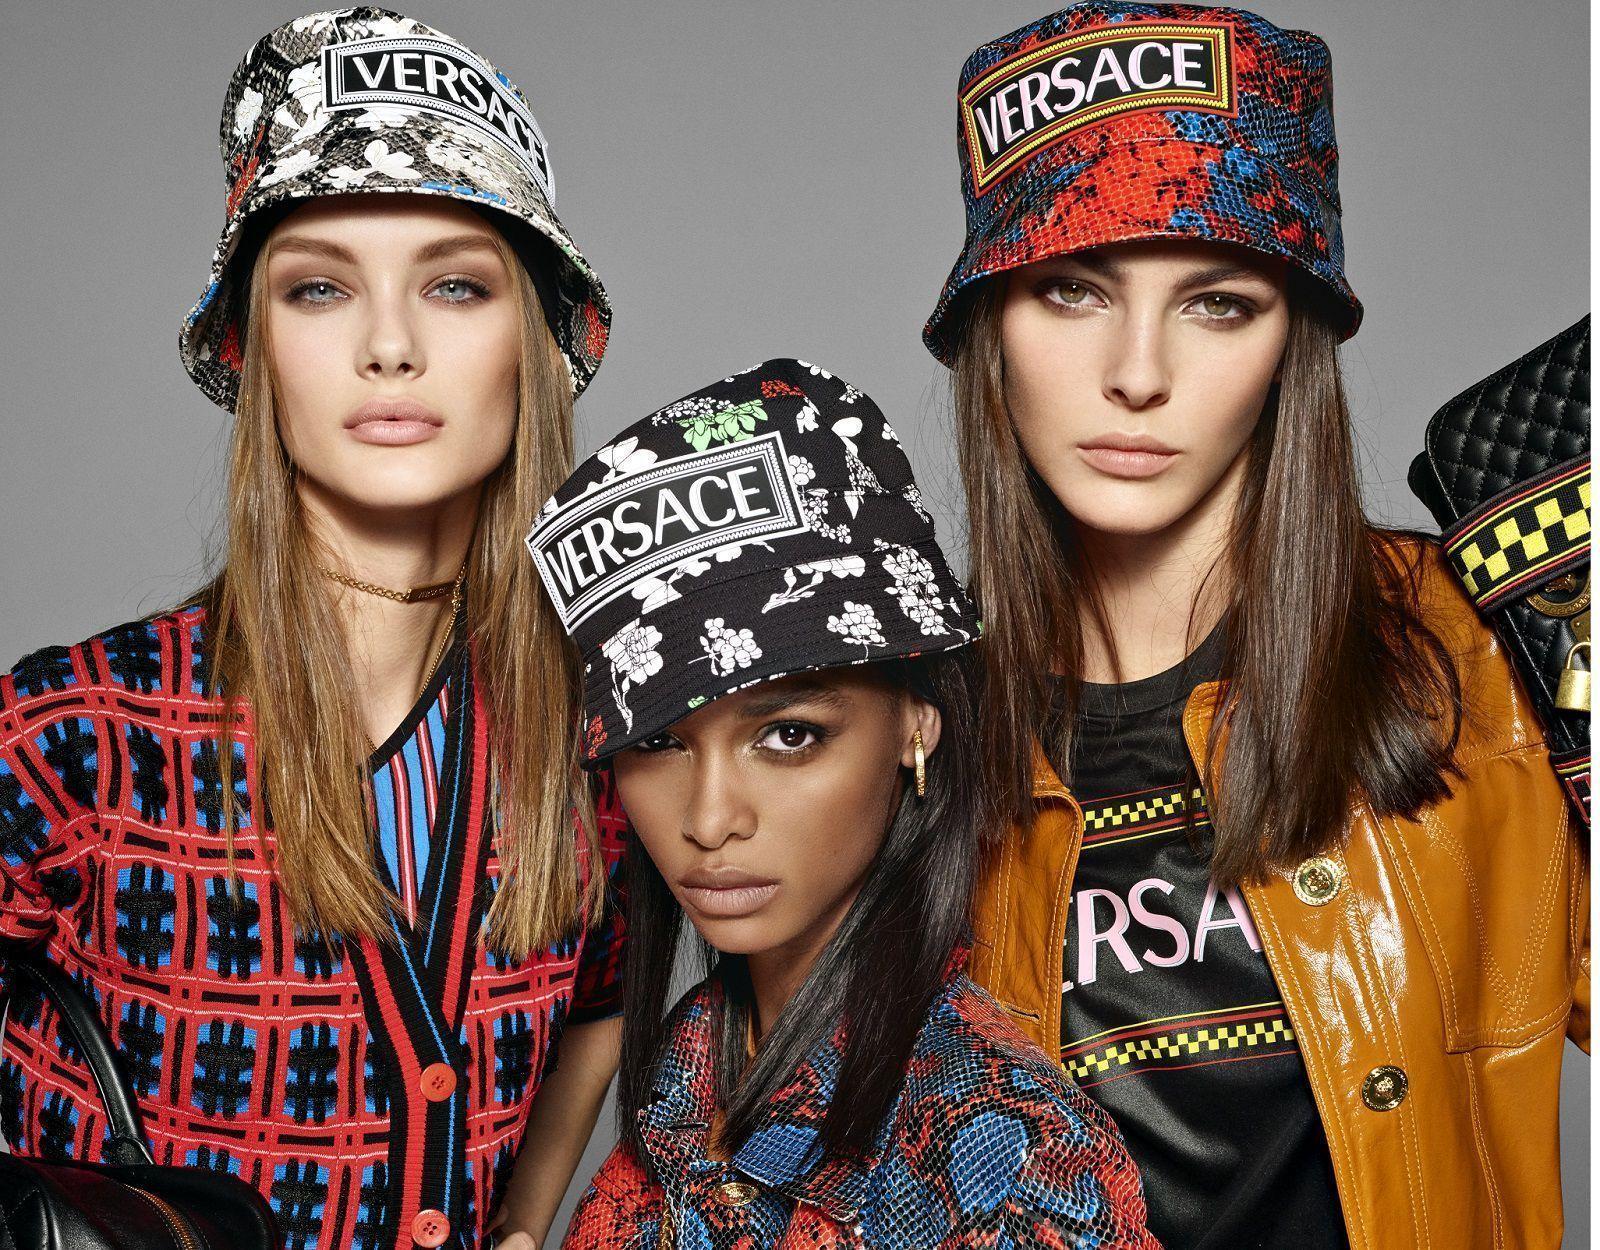 Versace SS19 - Bella Hadid